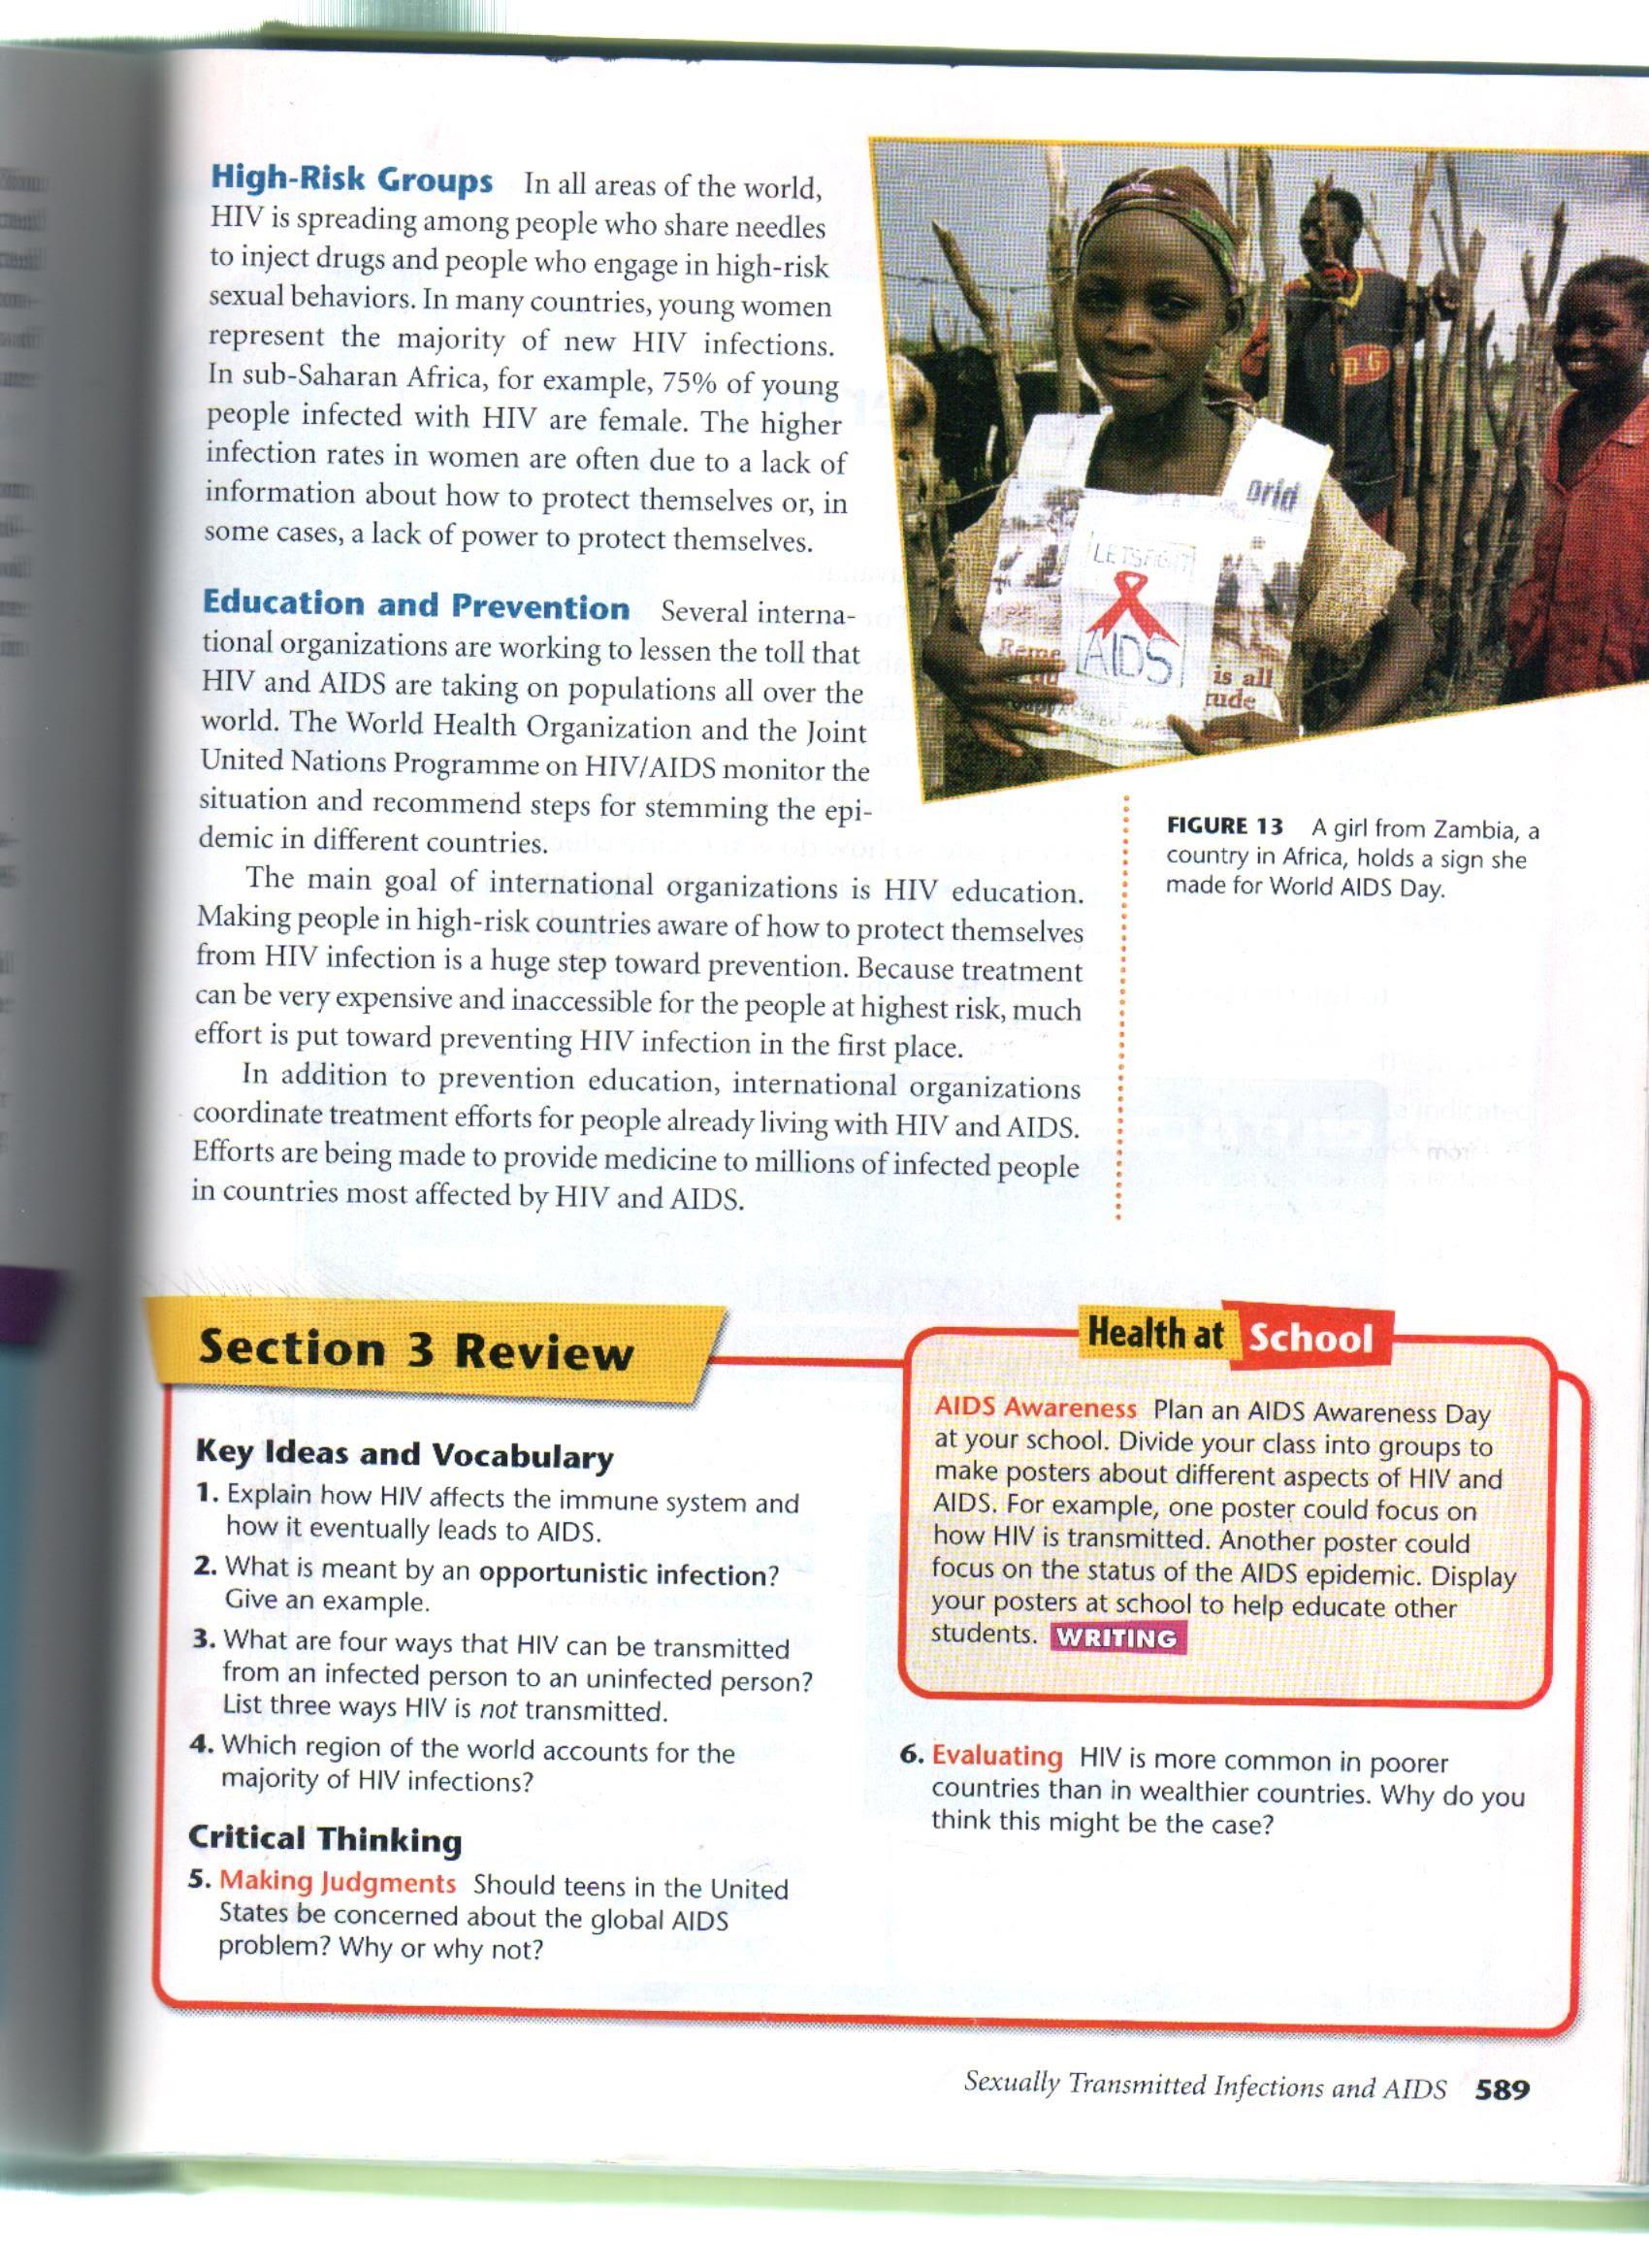 Homework Amp Classwork Assignments